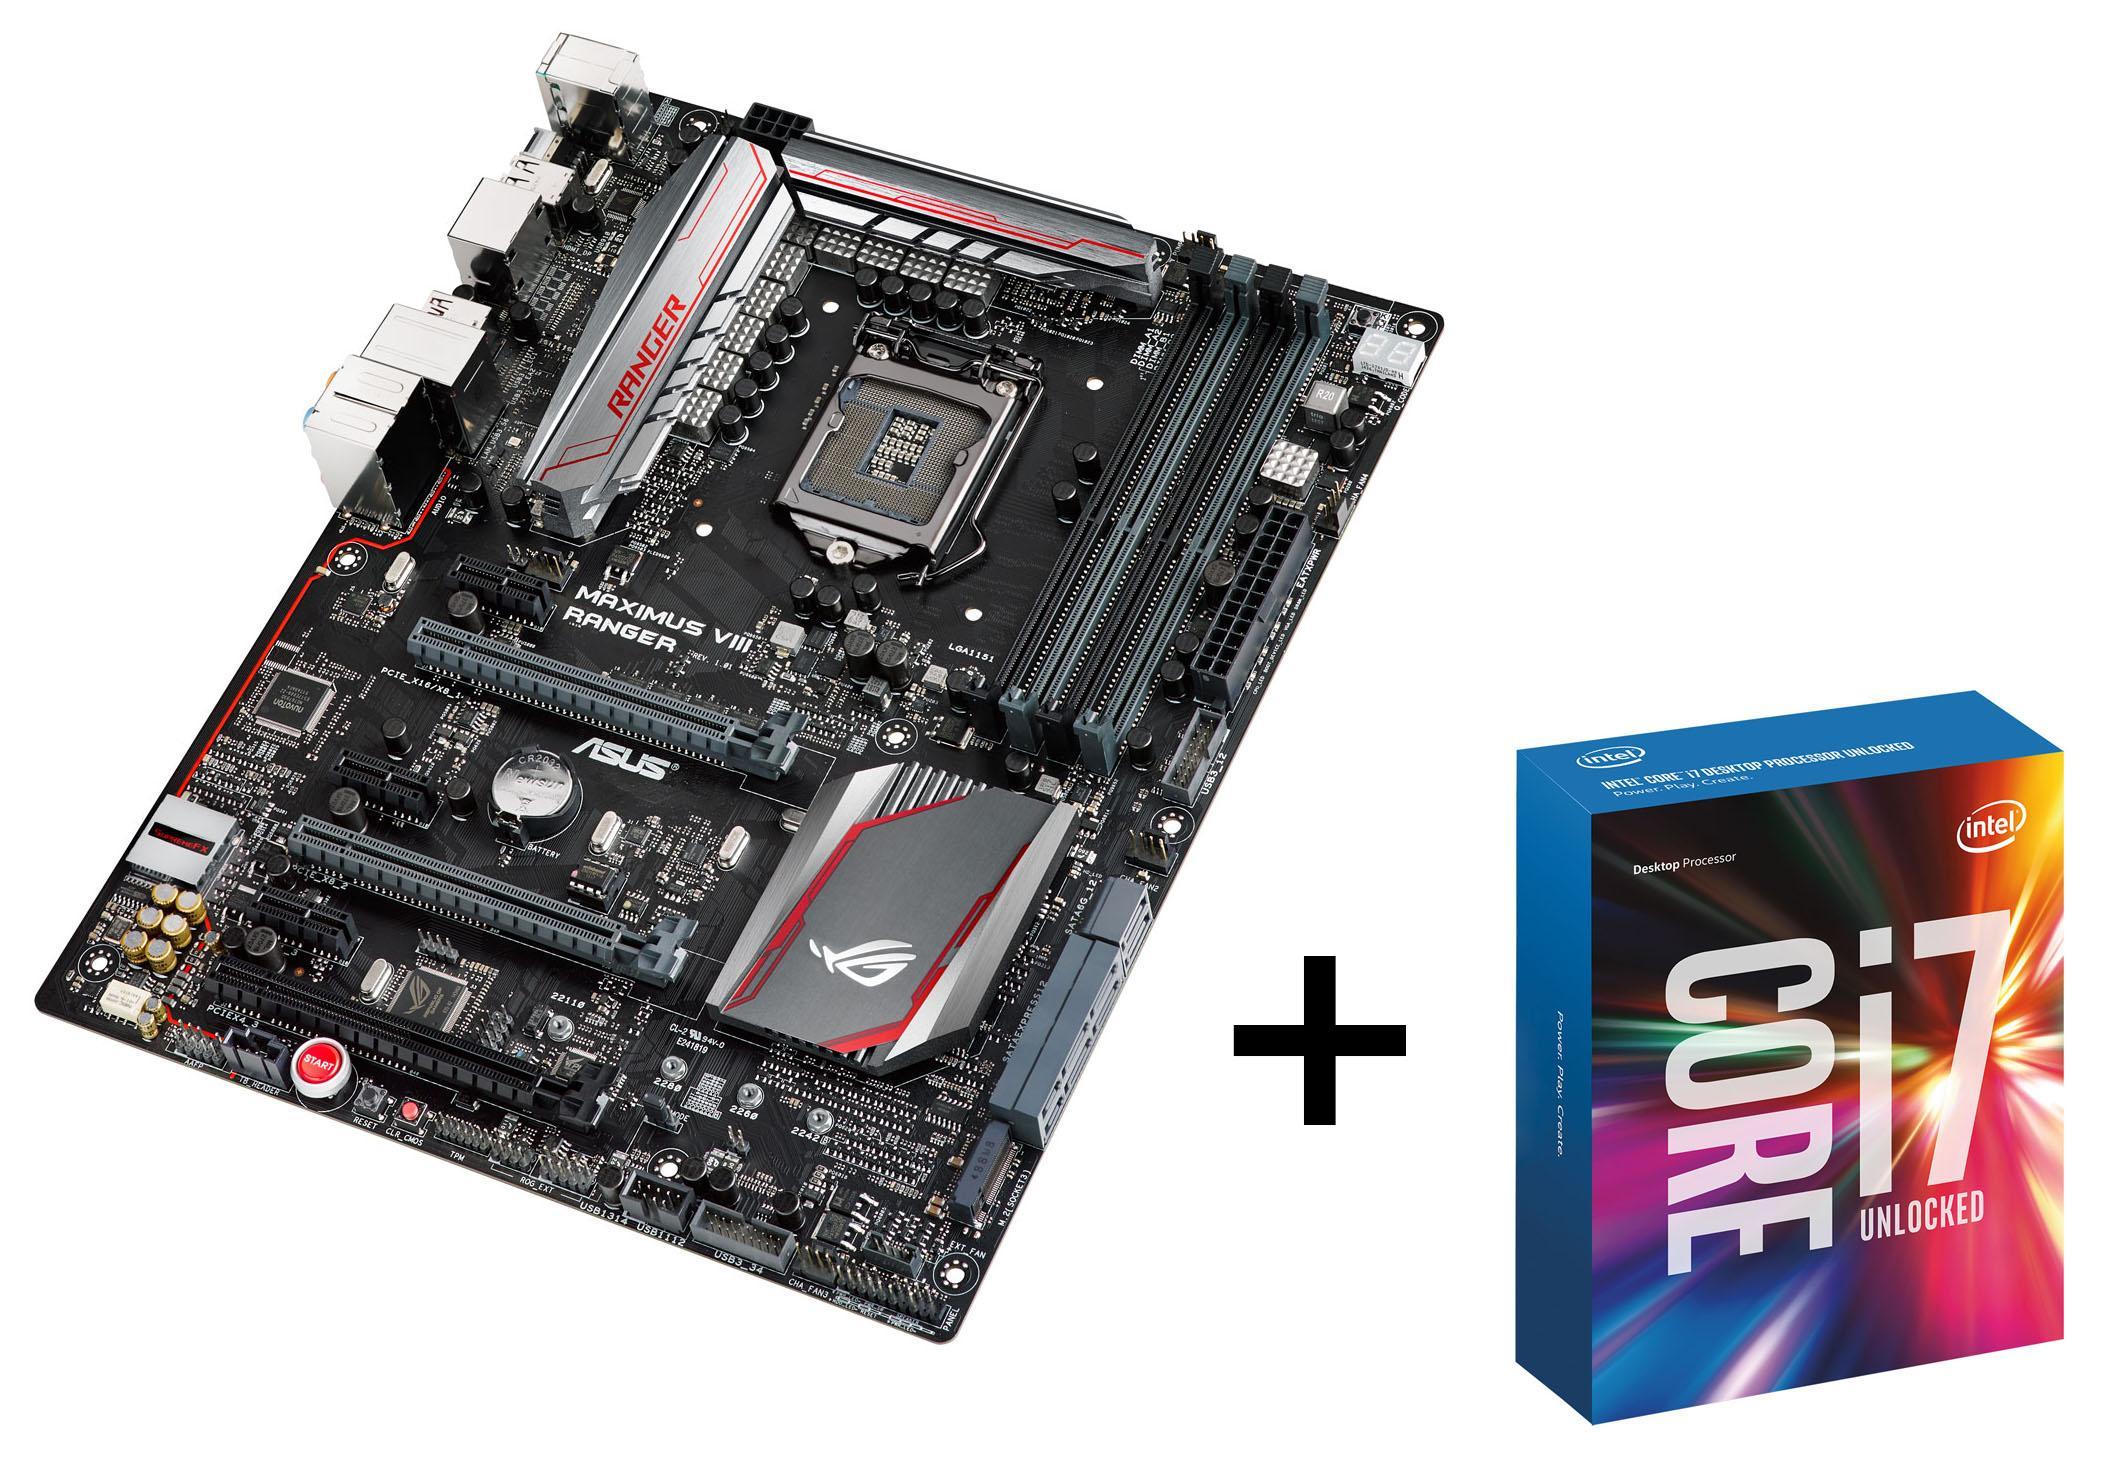 Pack carte mère Asus Maximus VIII Ranger + processeur intel Core i7-6700K (via ODR 150€)